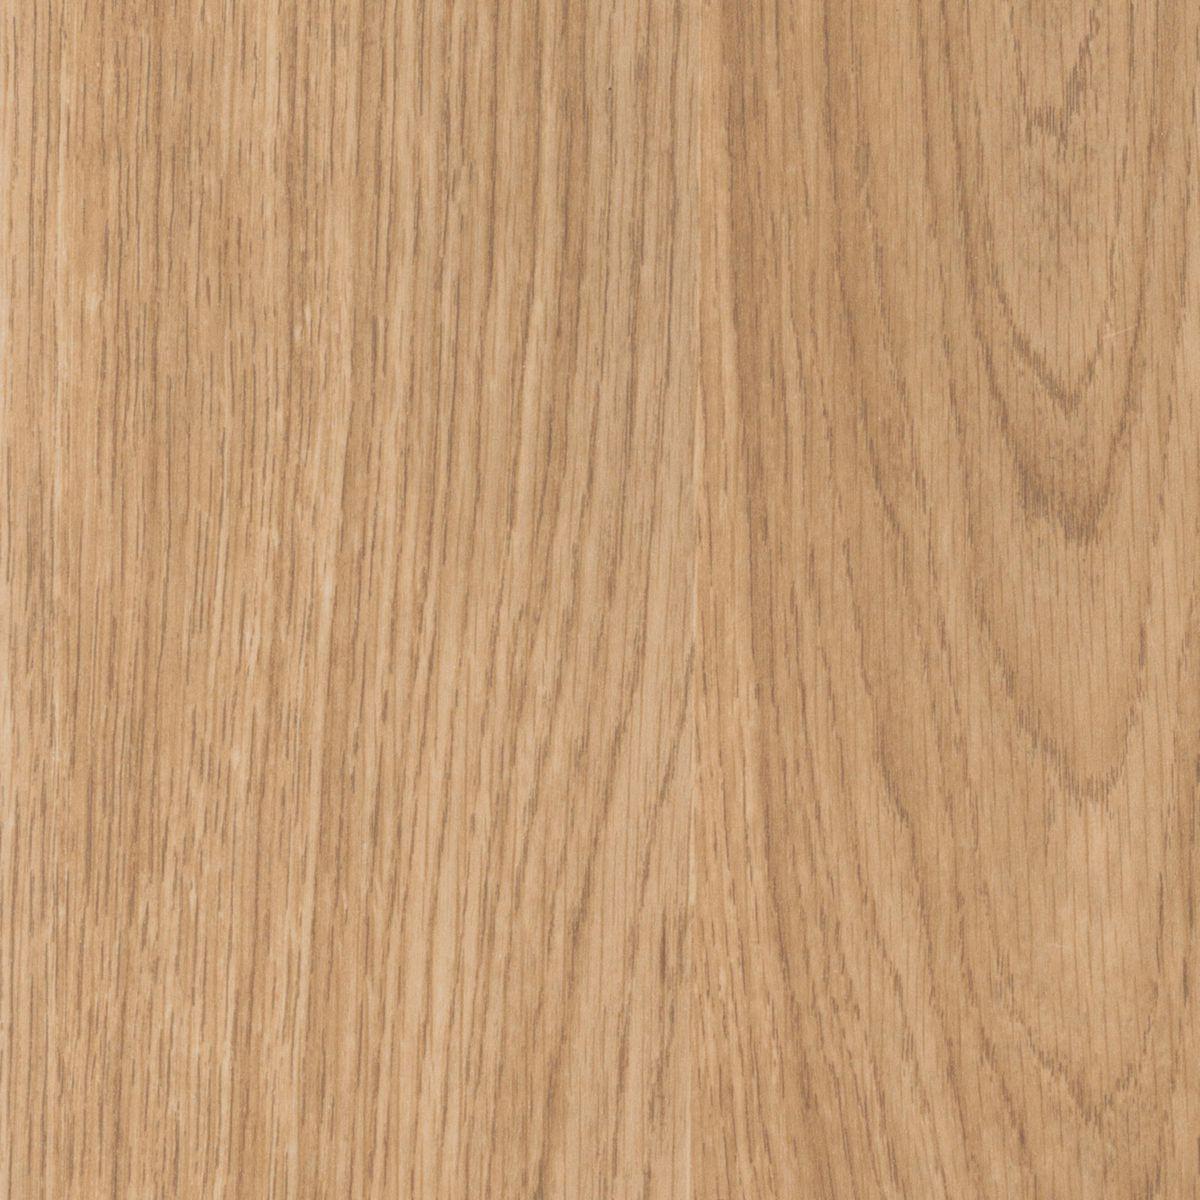 Prix Feuille Stratifié Formica stratifié hpl woods hgp elegant oak f5374 nat naturel 305x130cm 0,7mm